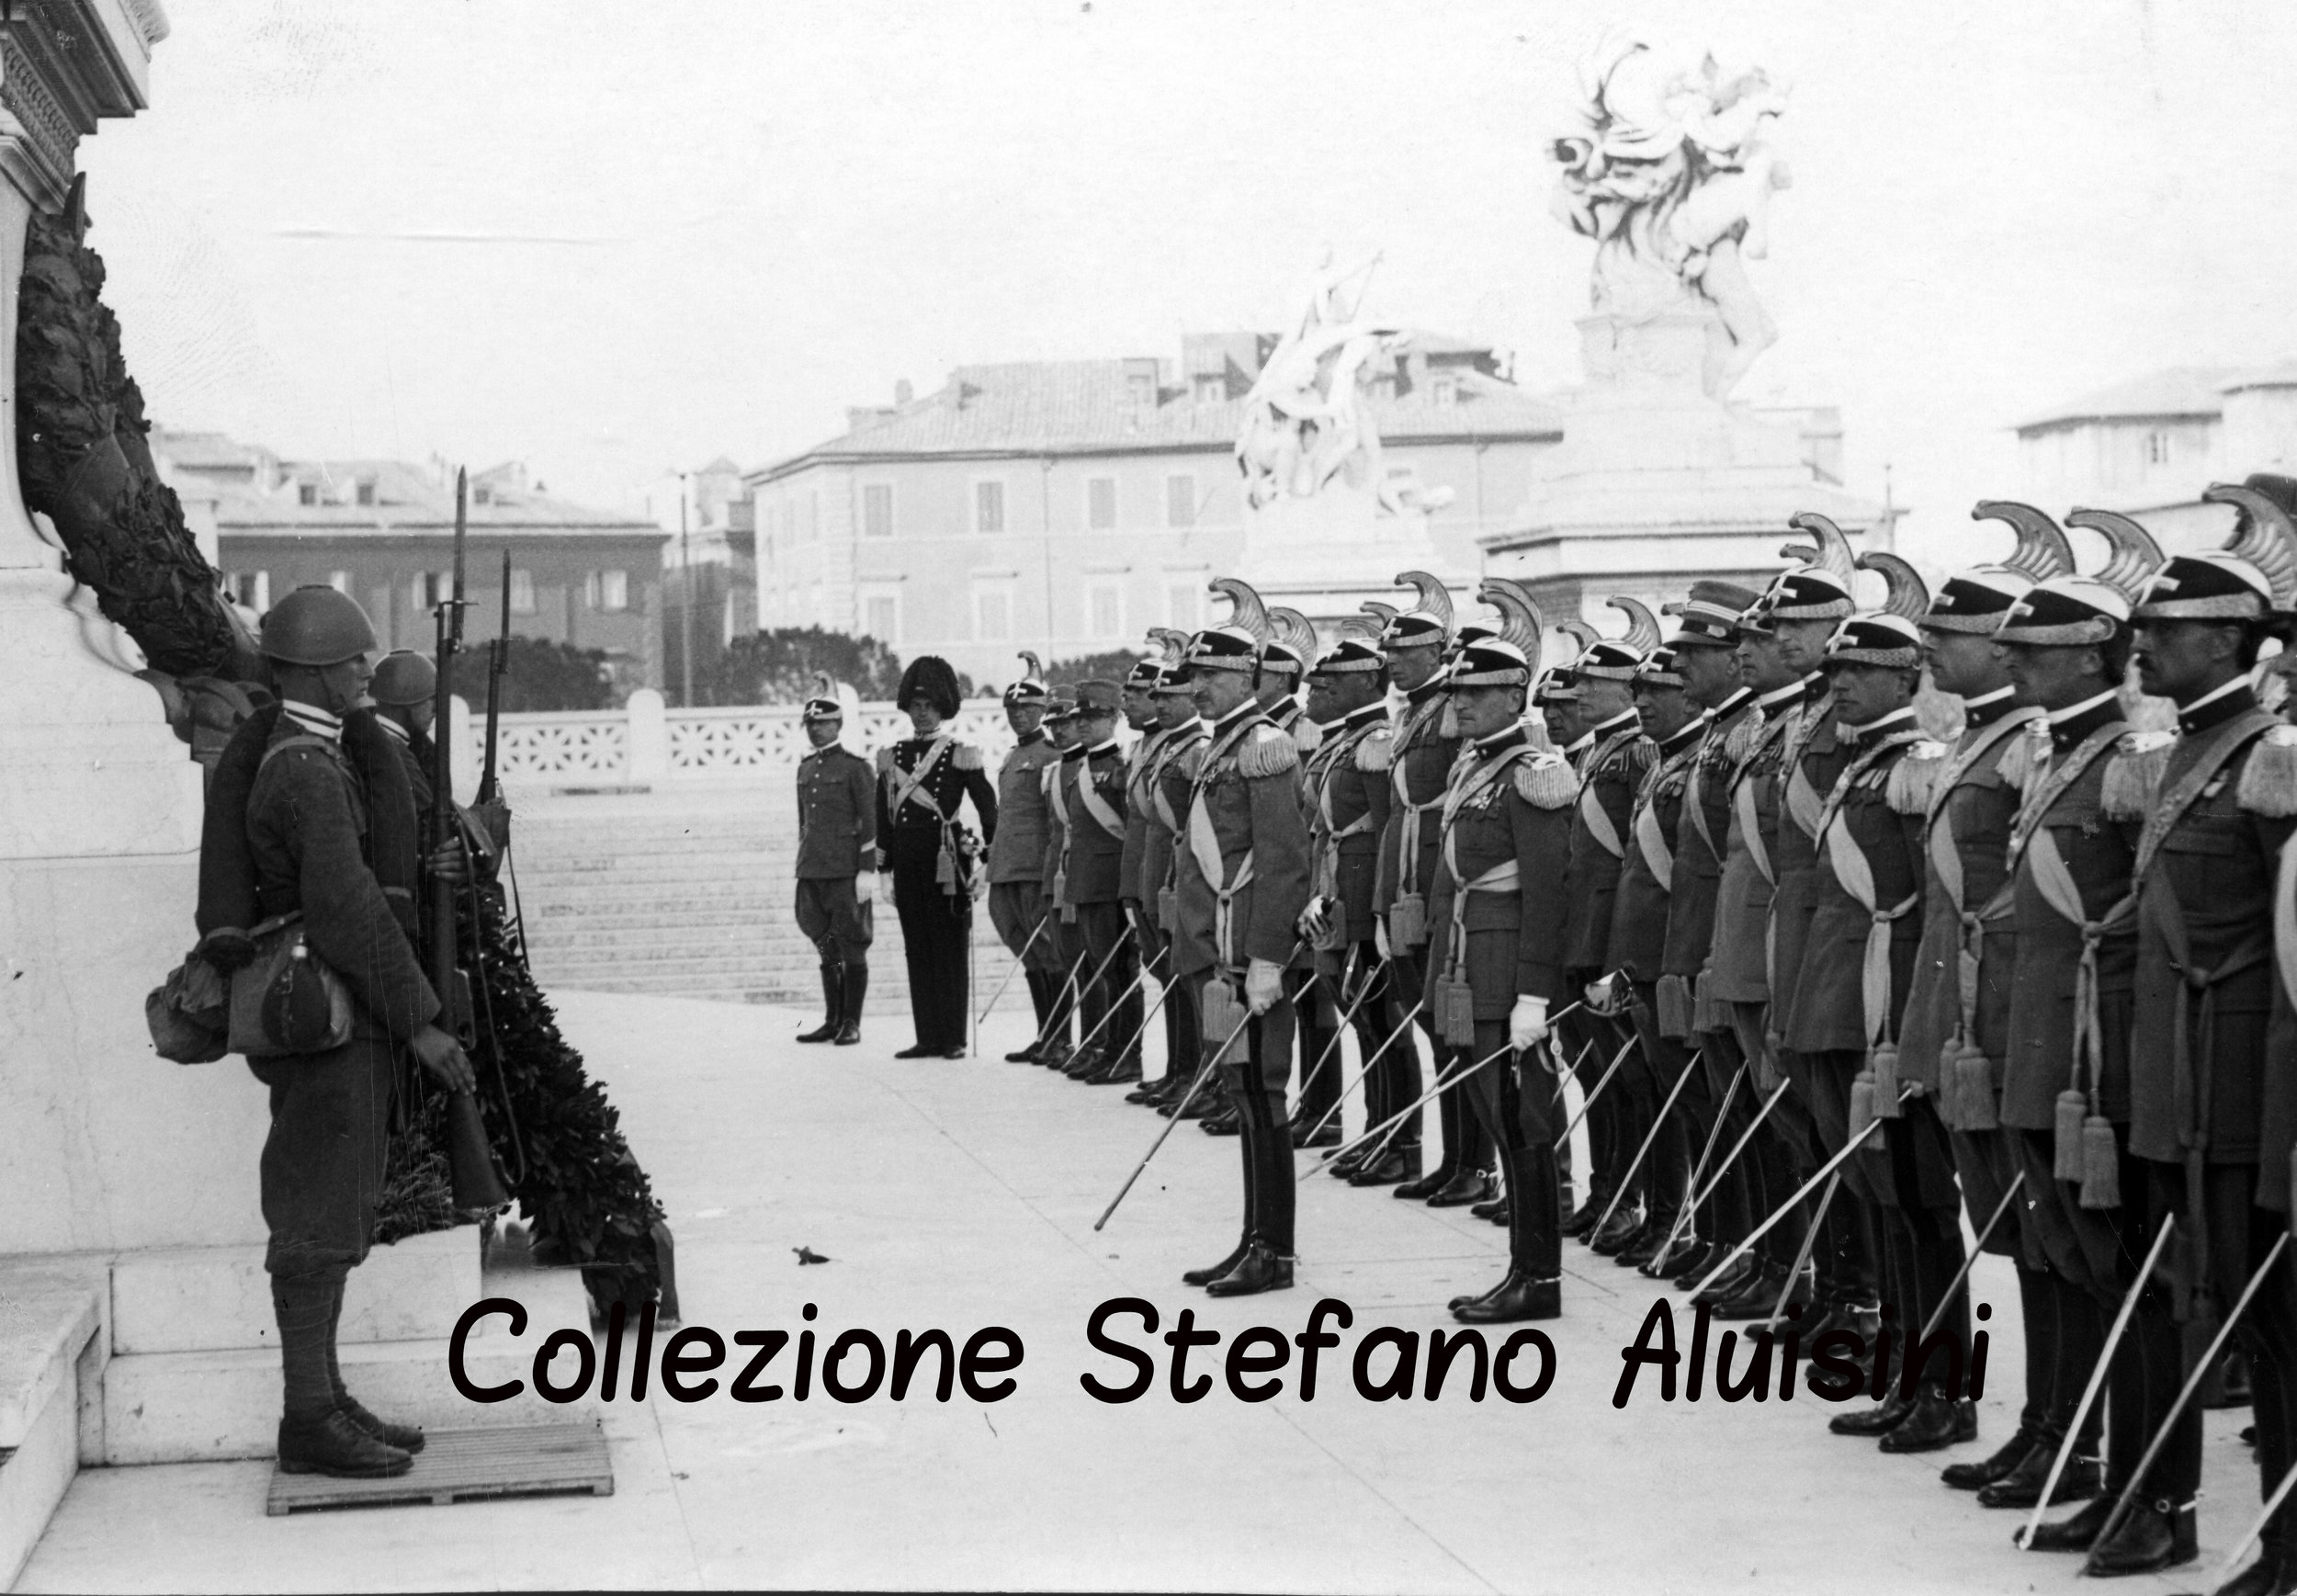 074 regg genova cavalleria milite ignoto 07 10 33.jpg